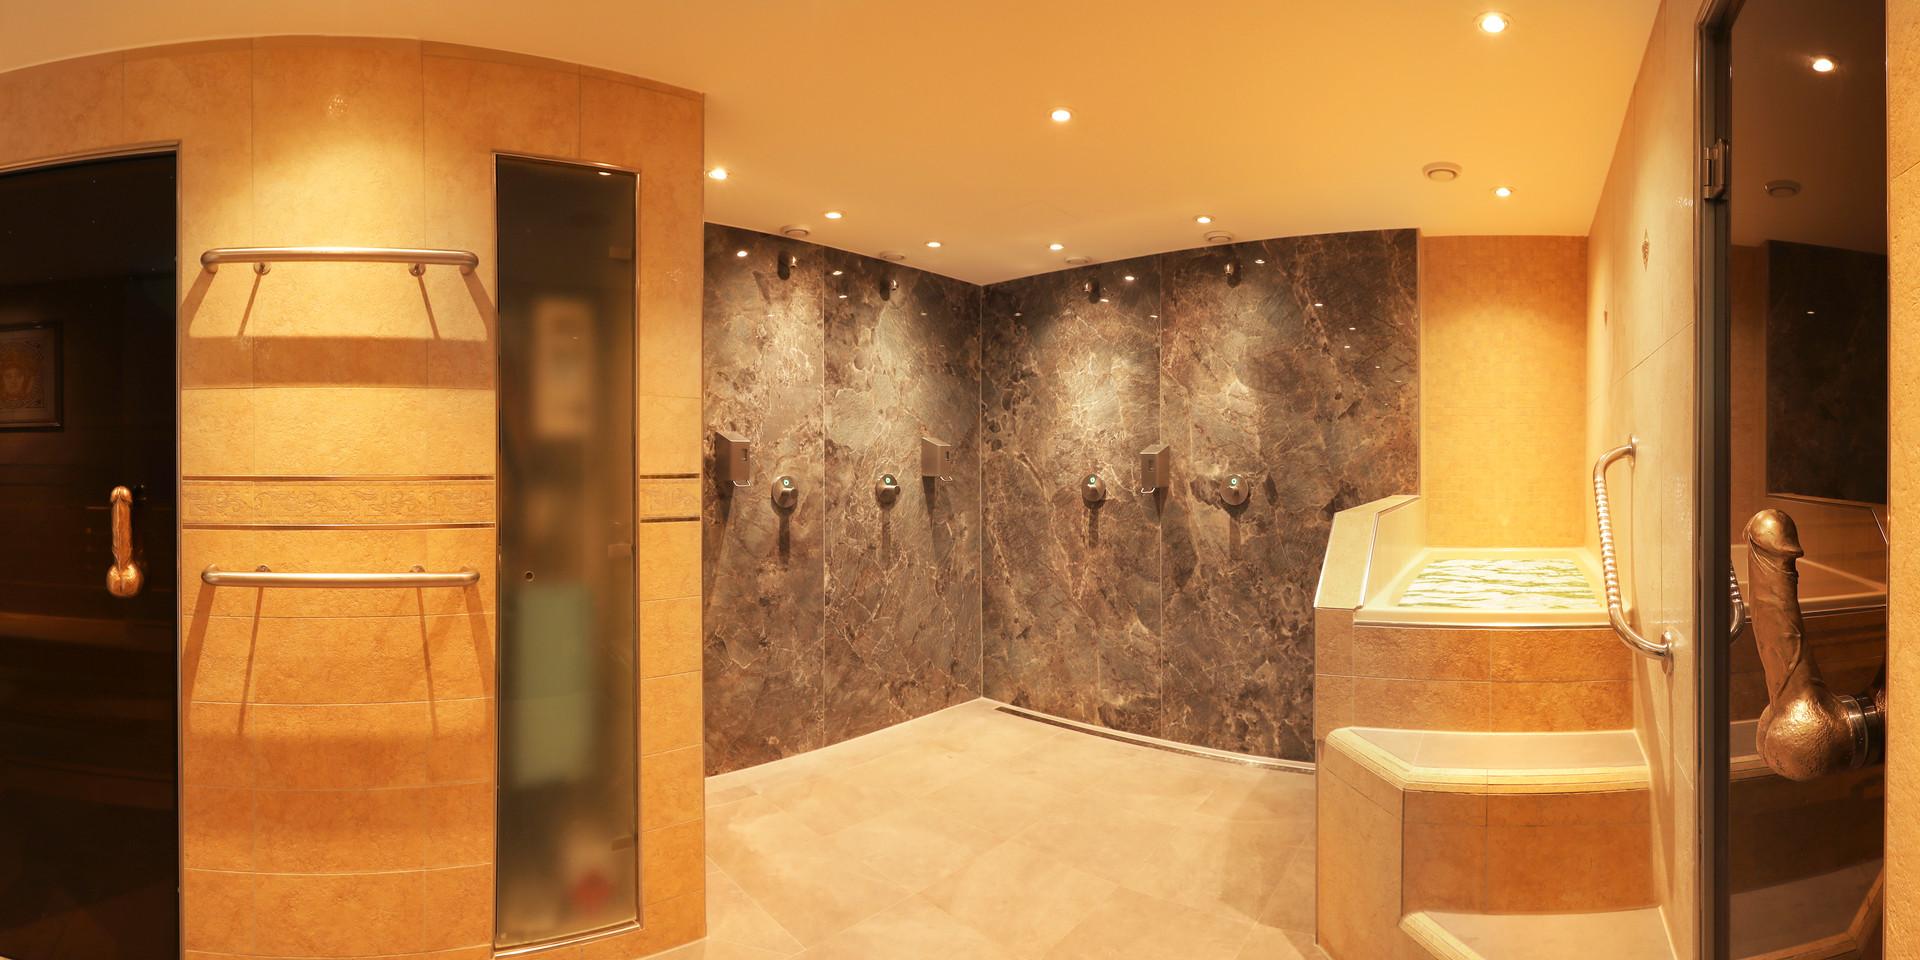 gay-sauna-renos-relax-club-showers